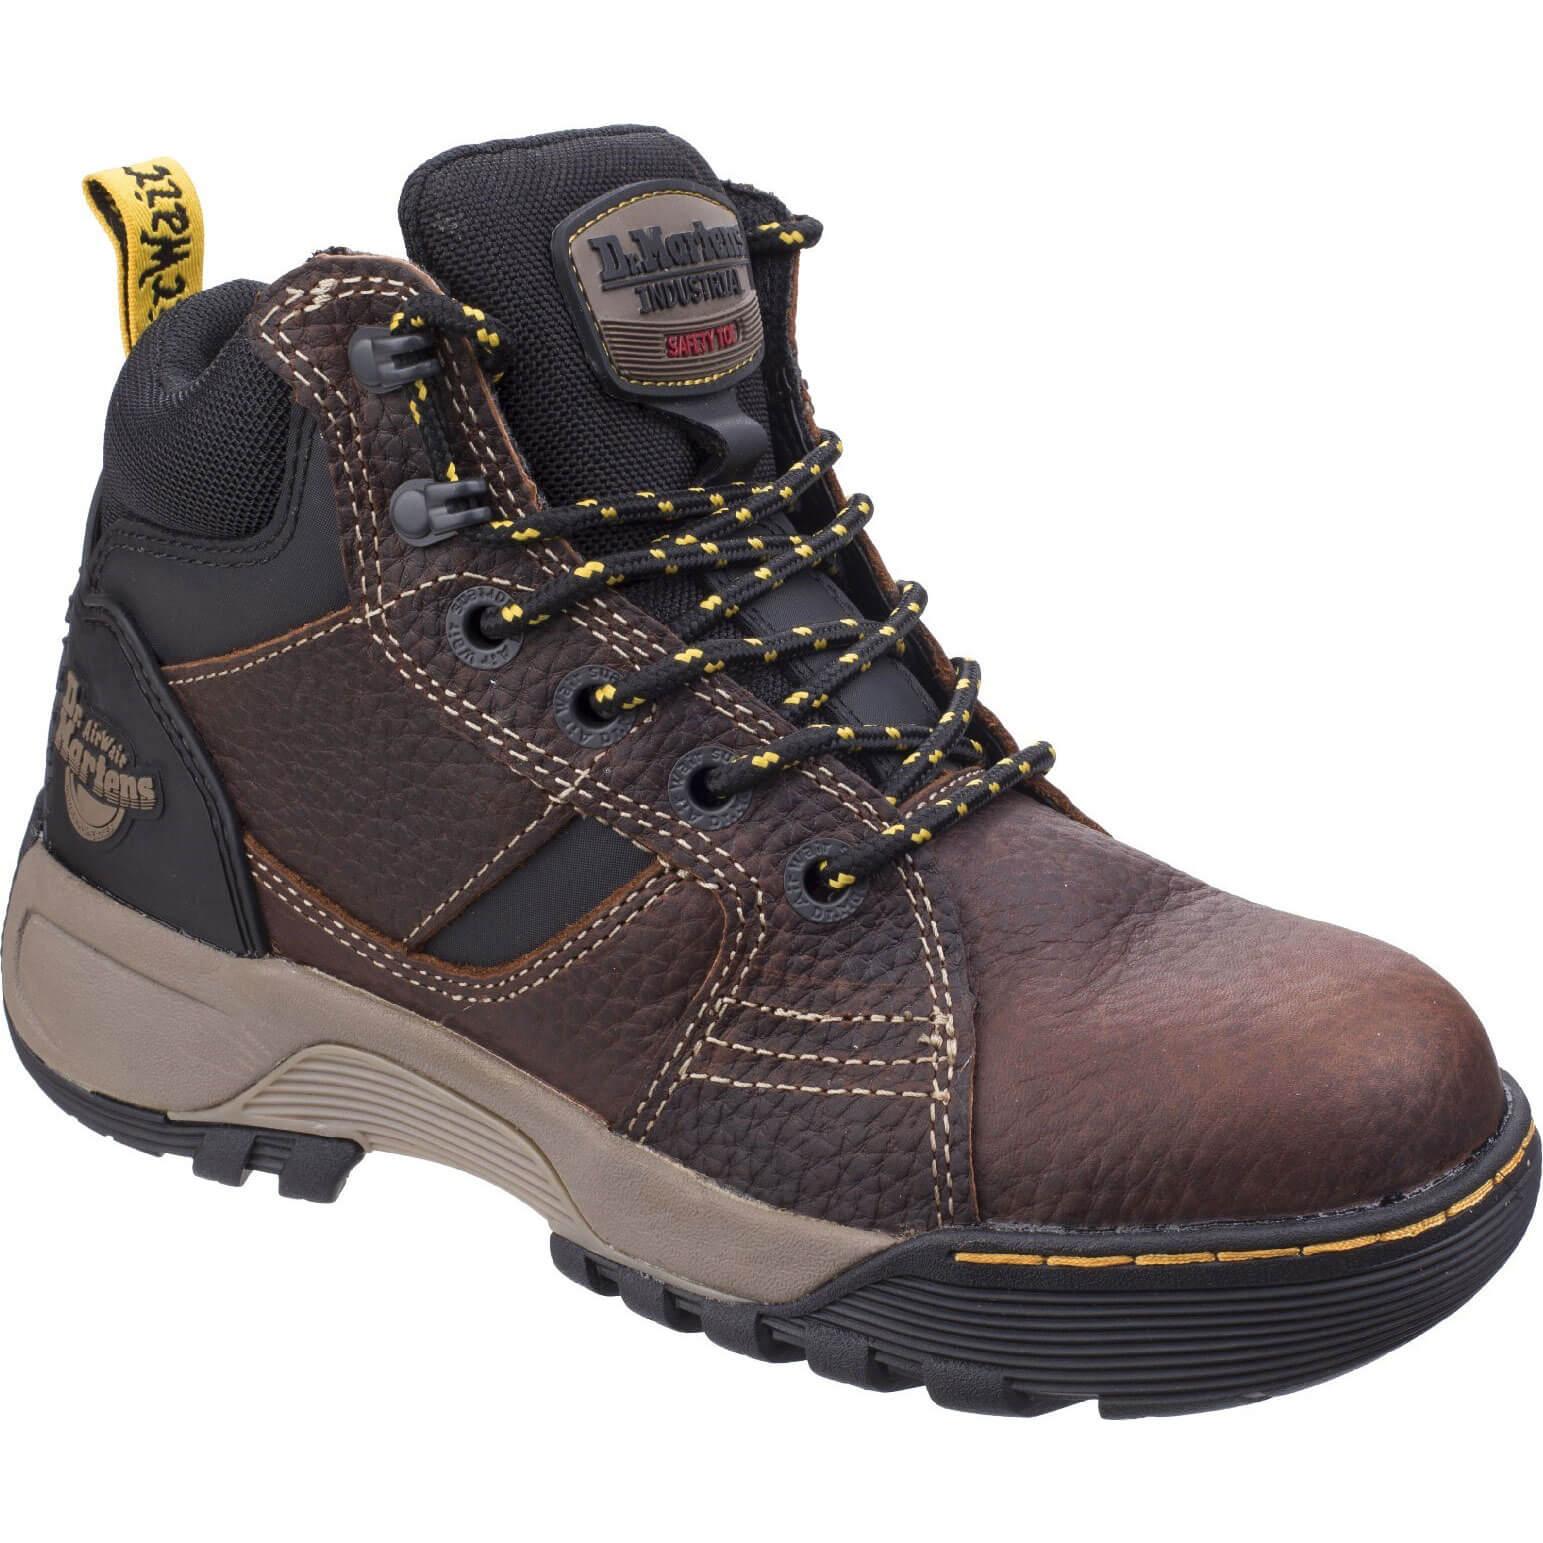 CHEAP Dr Martens Mens Grapple Safety Boots Teak Size 13 – Men's Footwear